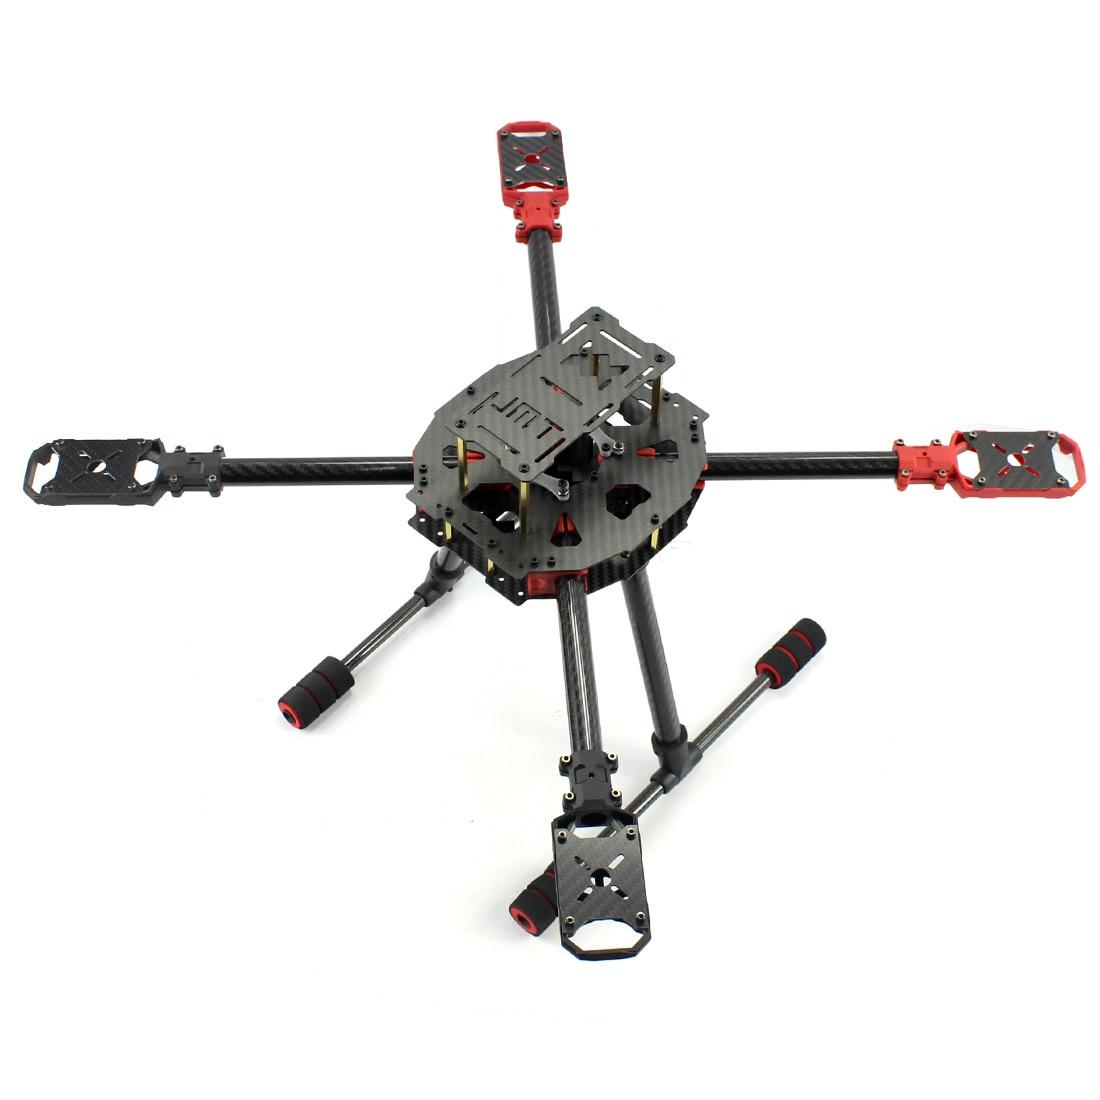 JMT DIY Mini J630 Frame Kit Carbon Fiber 4 axle Foldable Rack for Helicopter RC Airplane